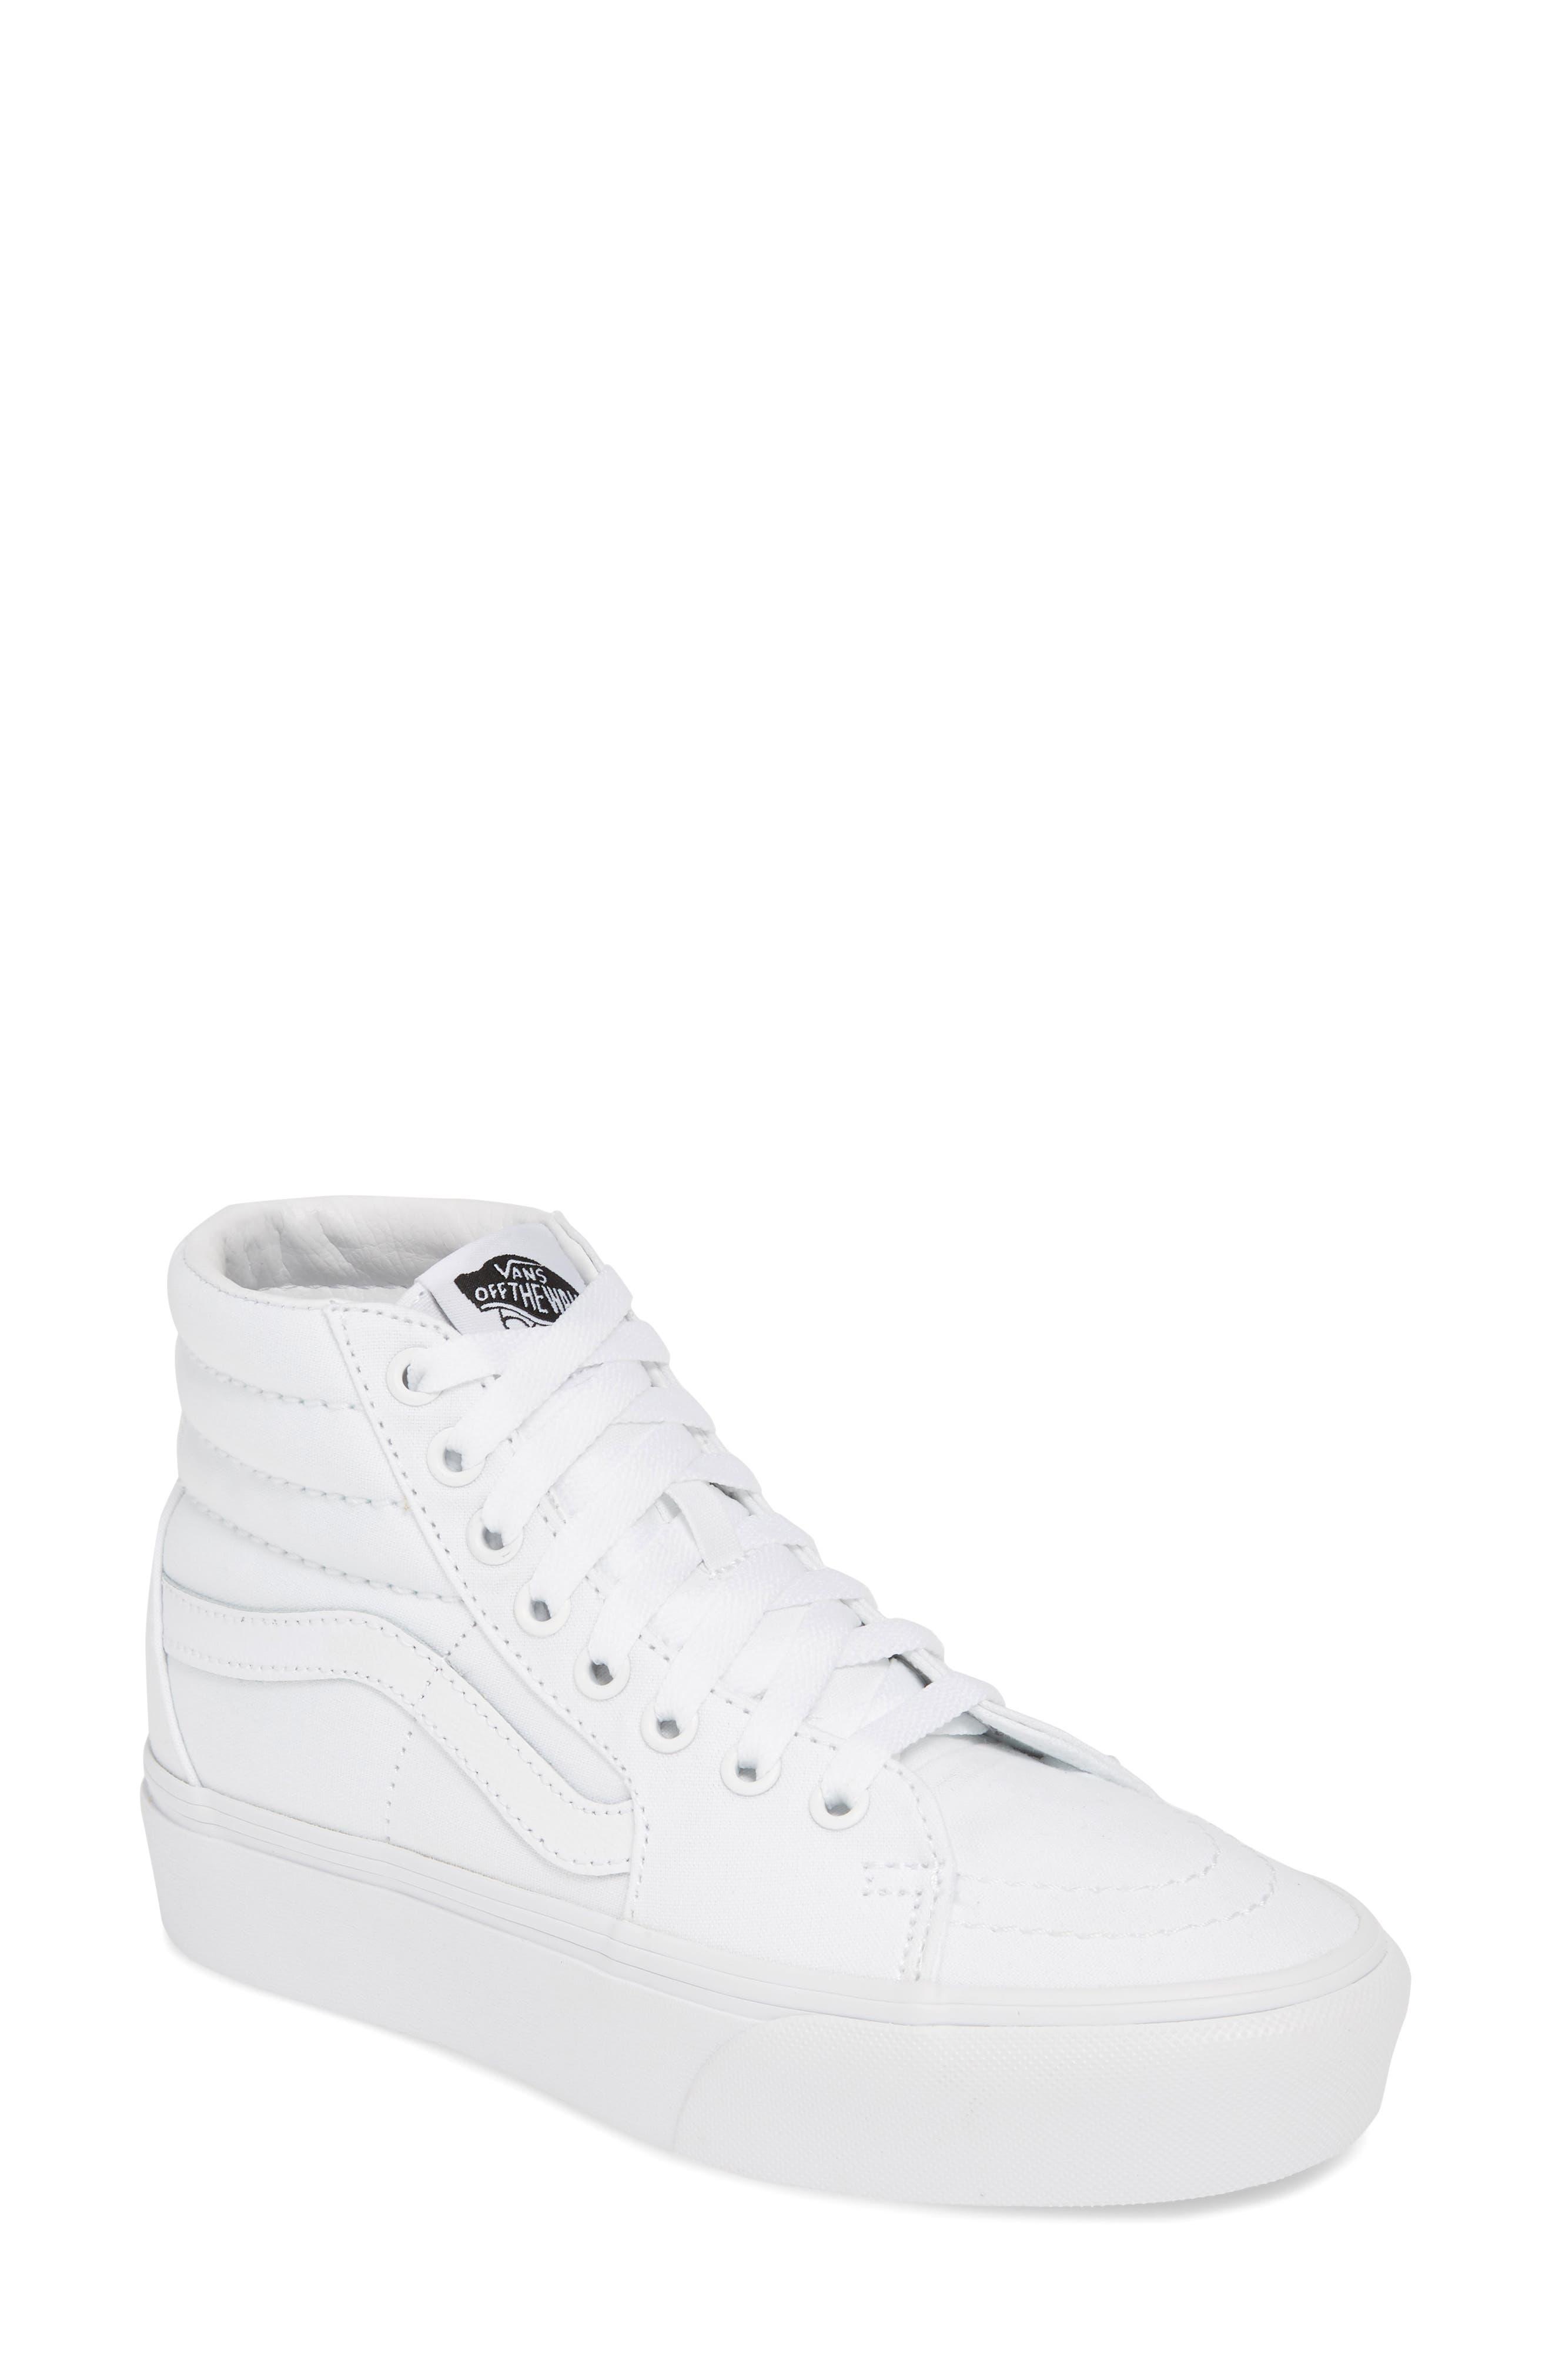 VANS Sk8-Hi Platform Sneaker, Main, color, TRUE WHITE/ TRUE WHITE